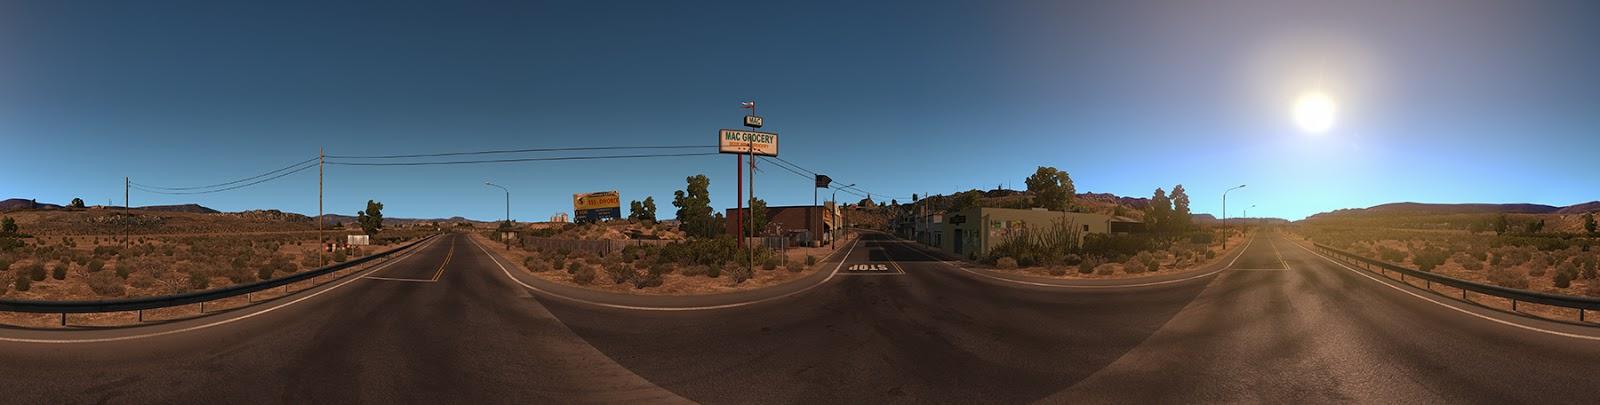 Panorama Kalifornie z American Truck Simulatoru 116426